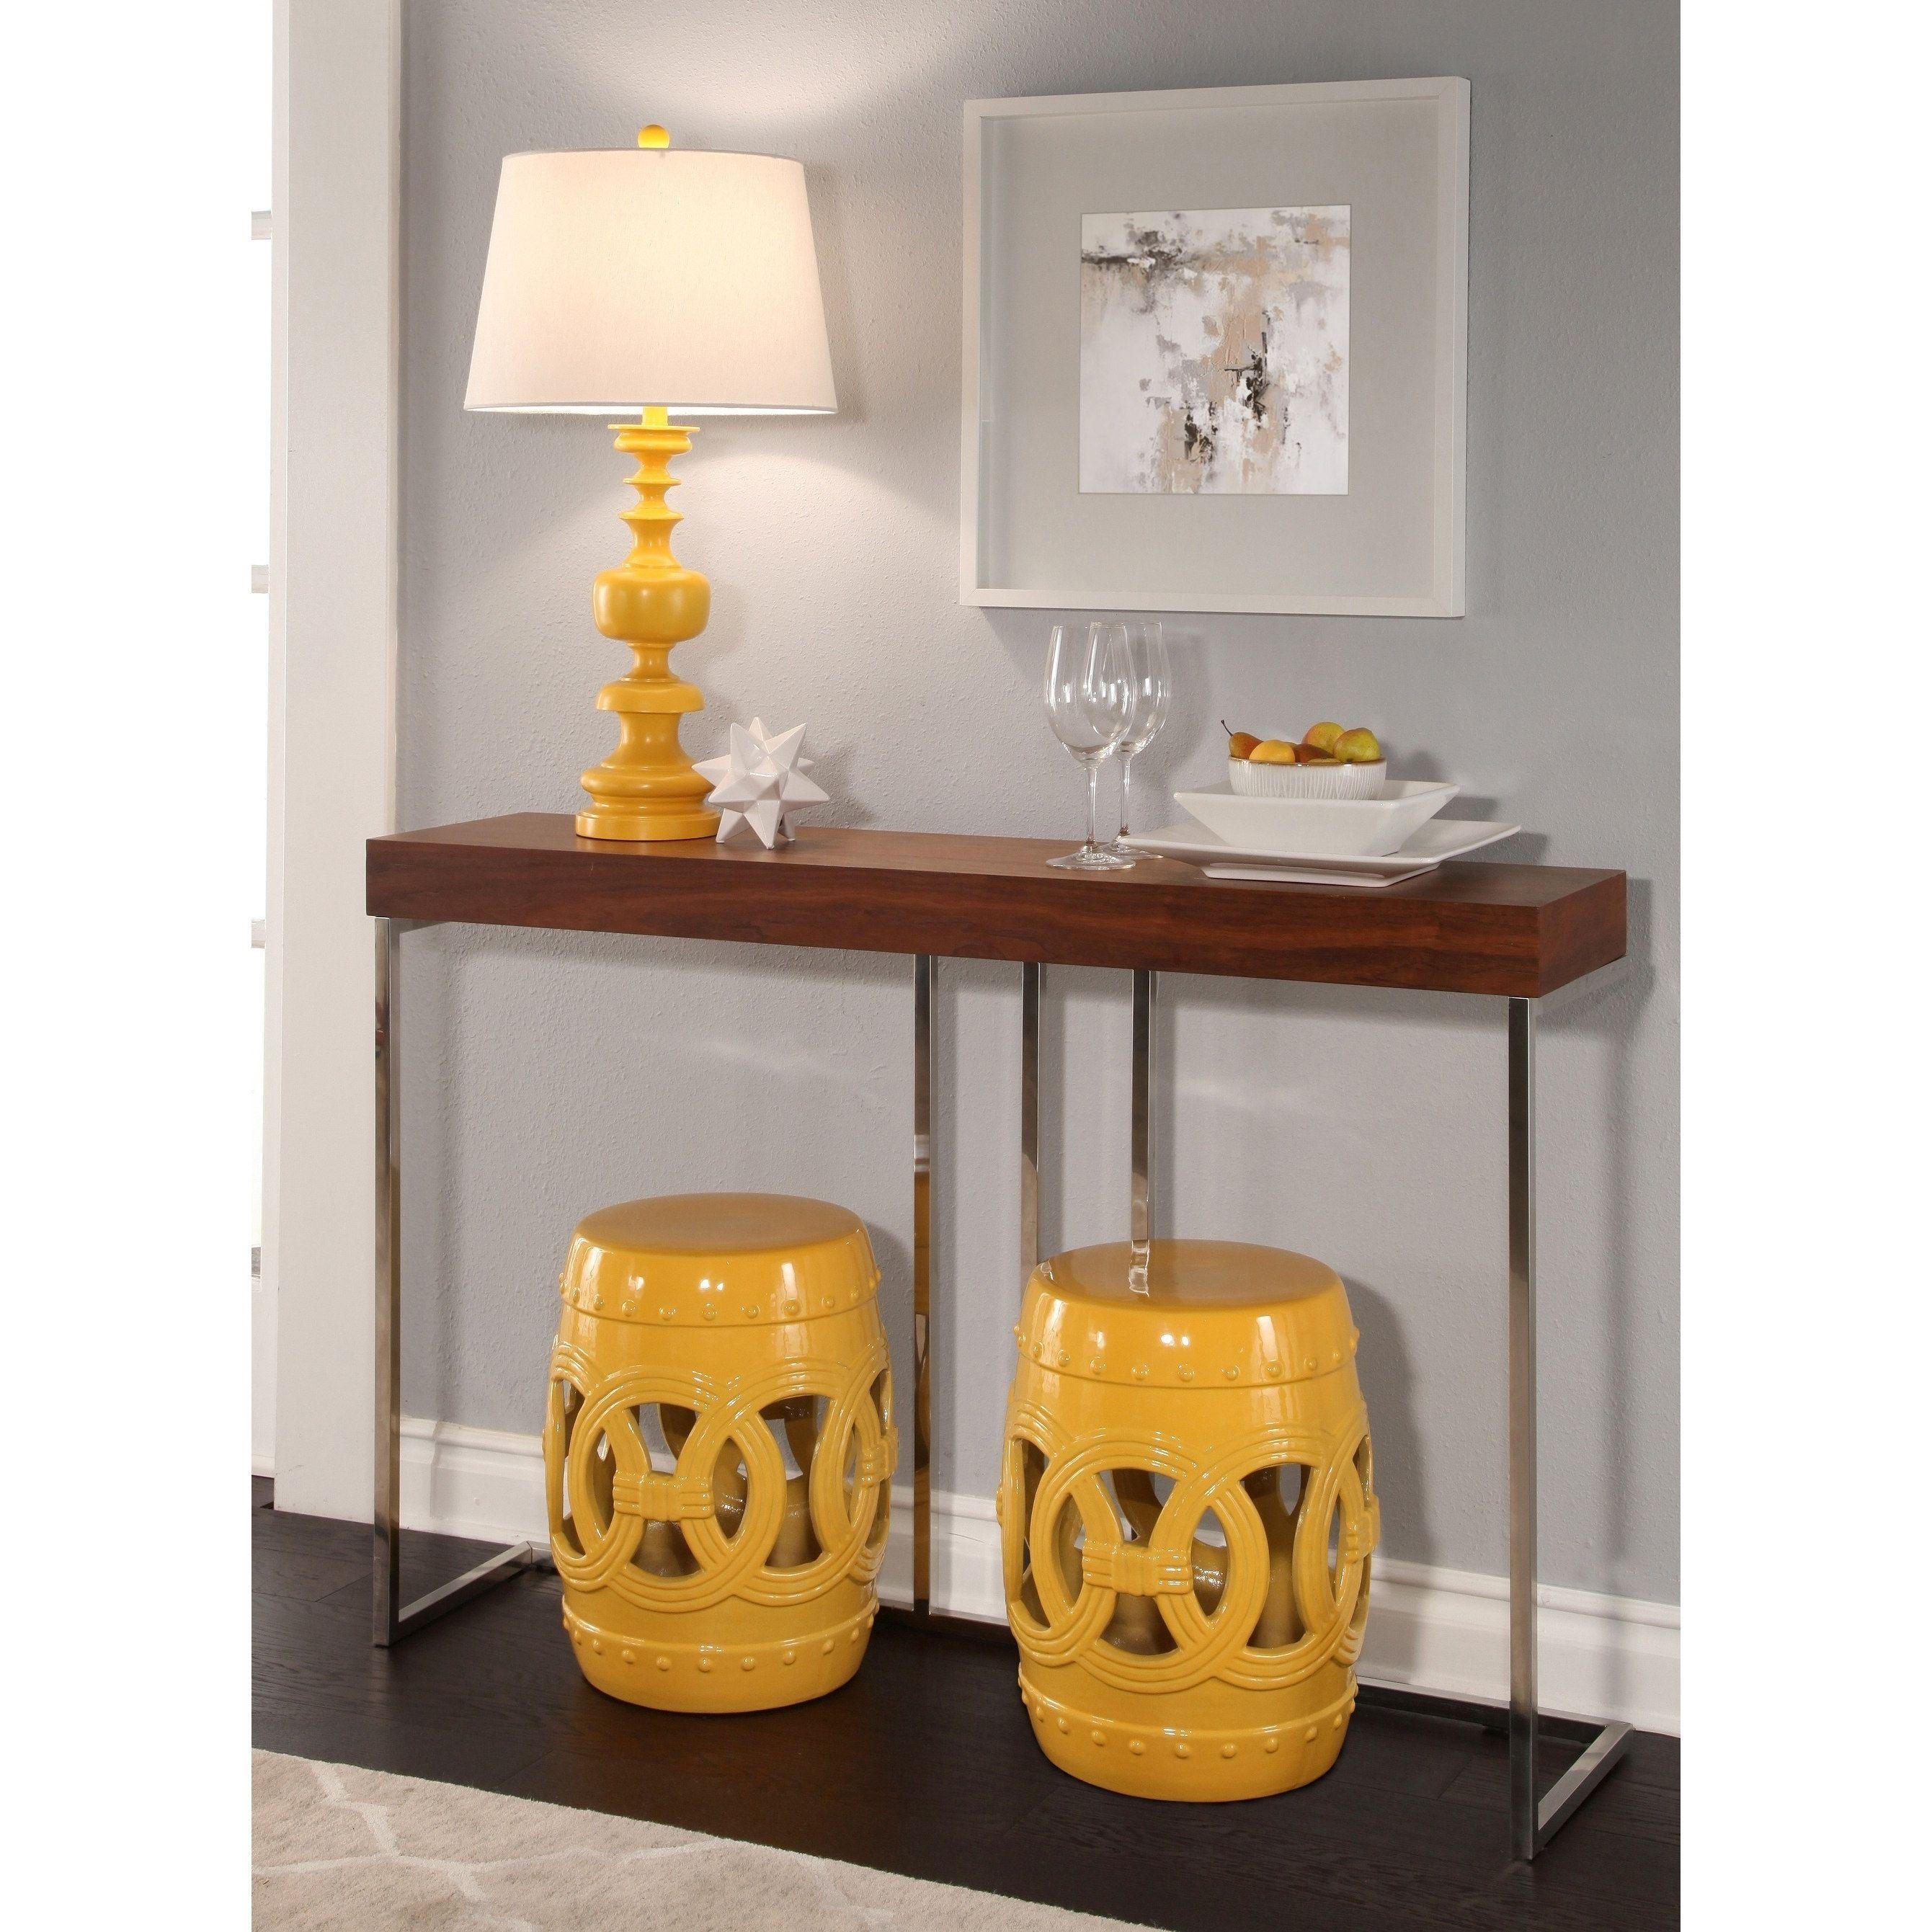 Admirable Abbyson Moroccan Yellow Garden Stool Set Of 2 Interiors Machost Co Dining Chair Design Ideas Machostcouk